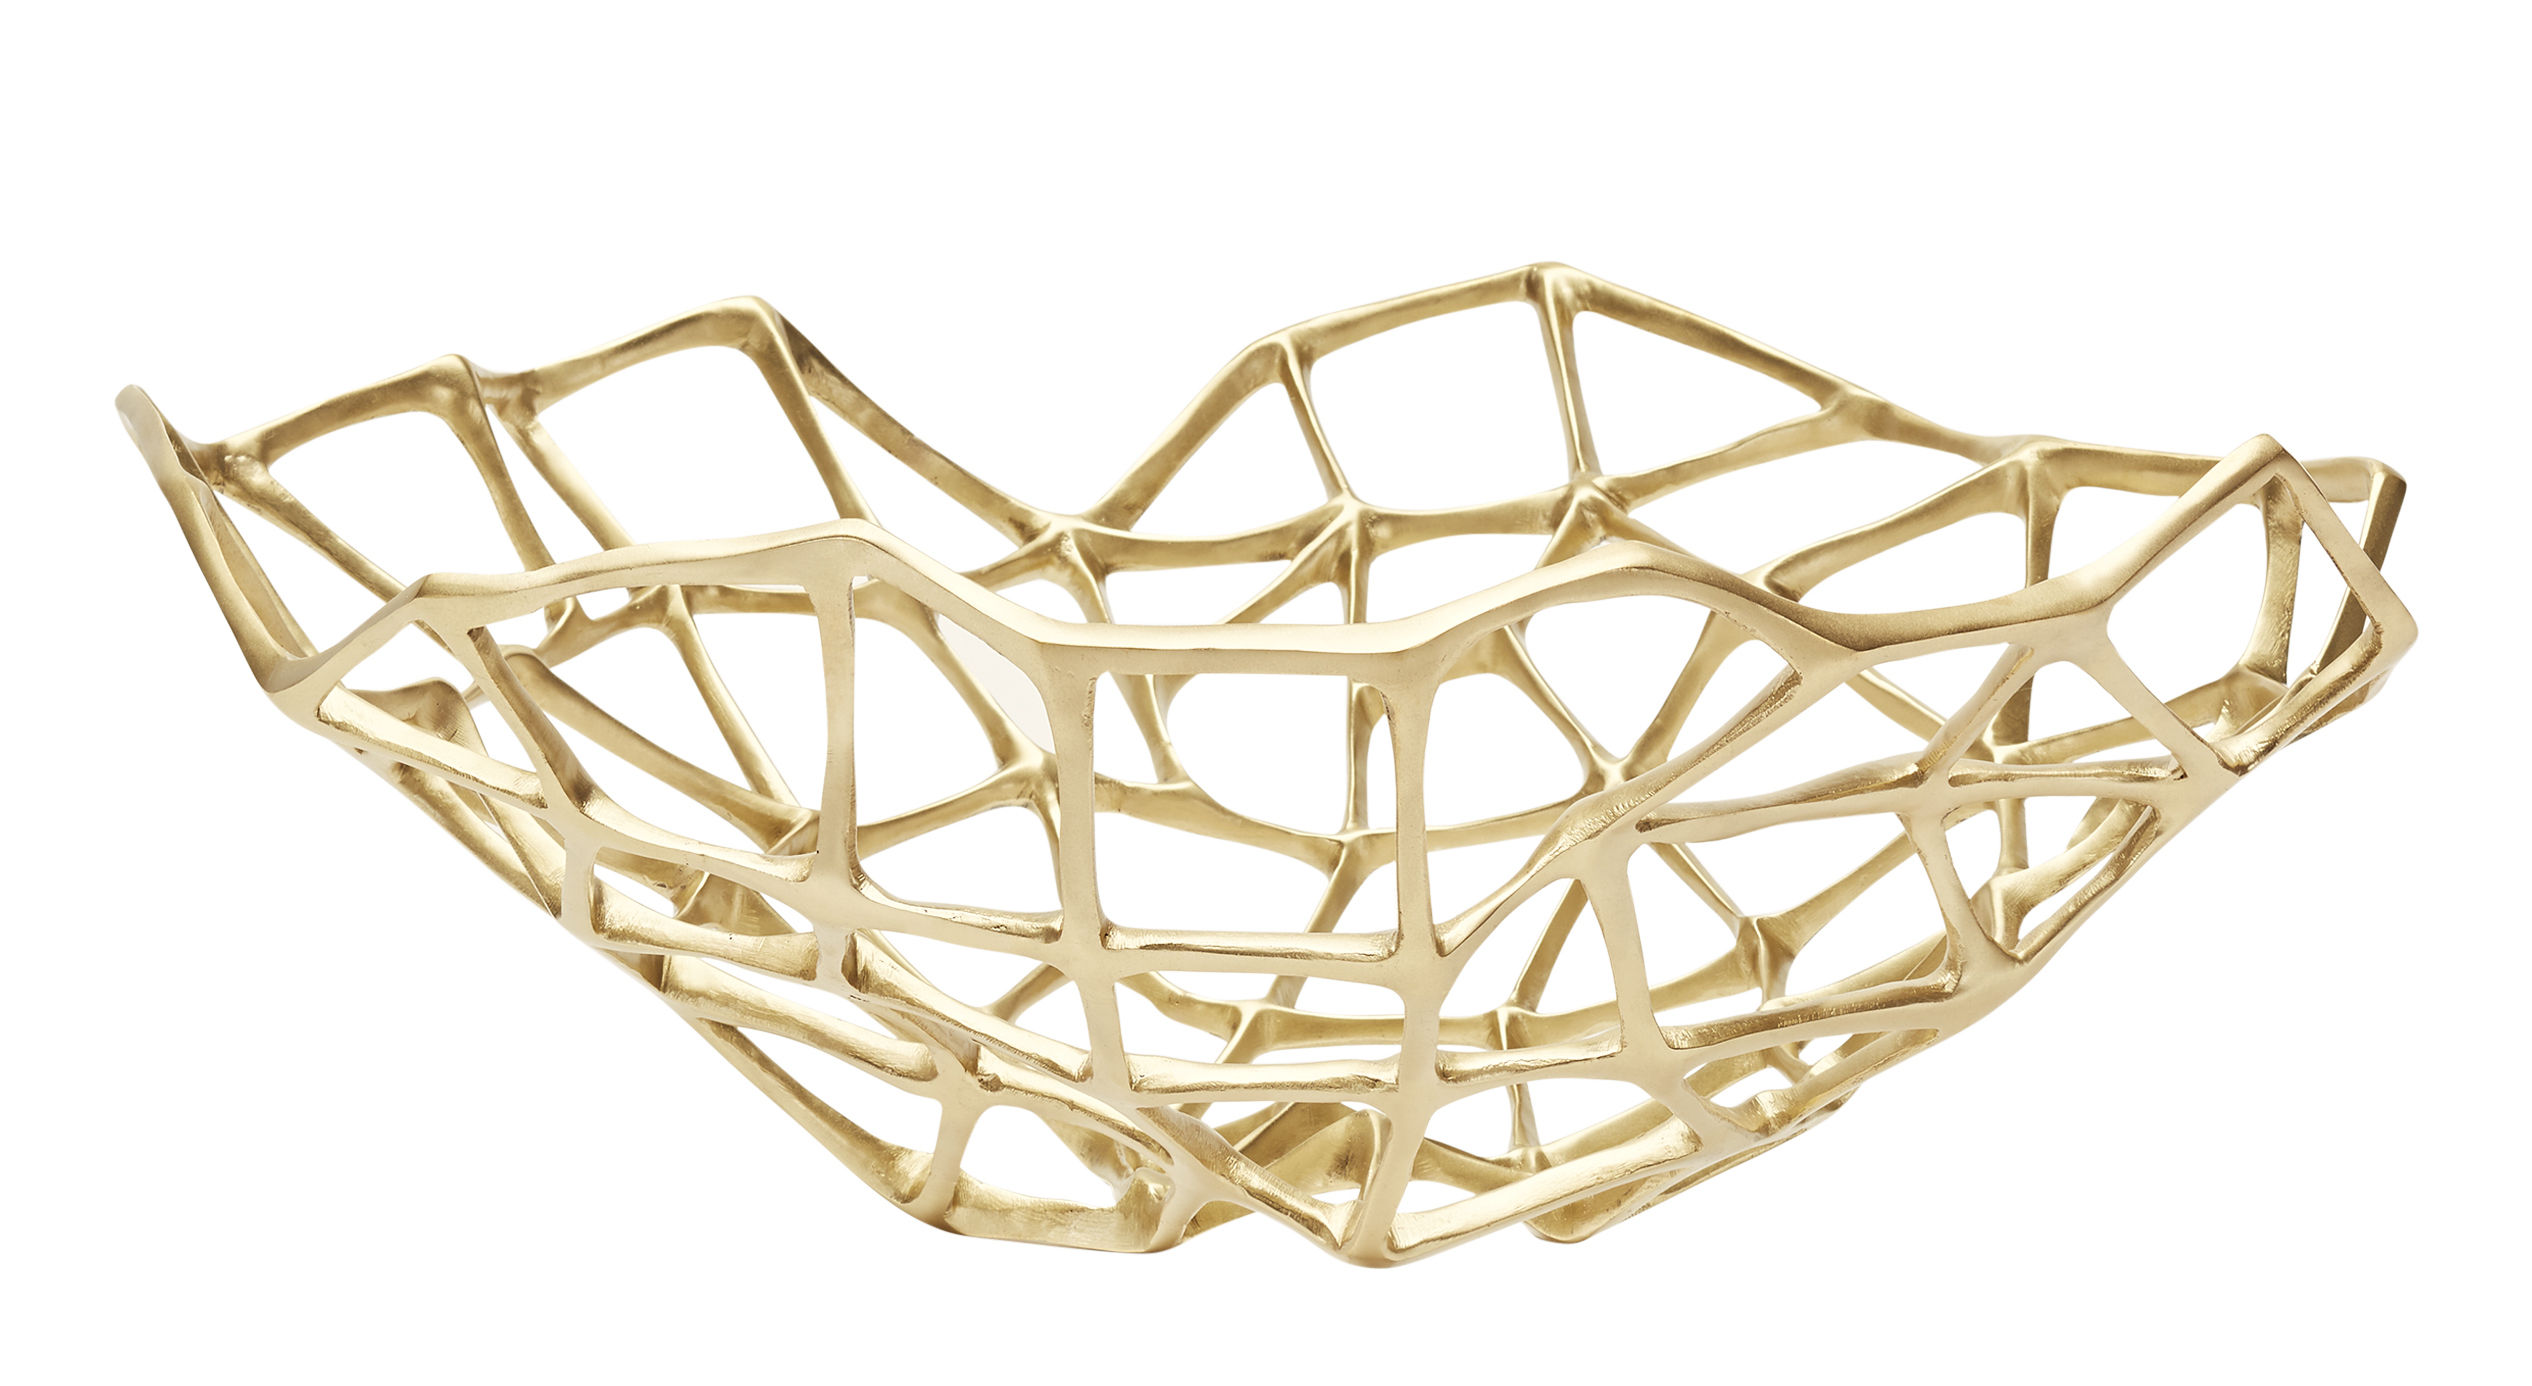 Tableware - Fruit Bowls & Centrepieces - Bone Extra Large Basket - Ø 60 cm by Tom Dixon - Ø 60 cm /Brass - Solid brass